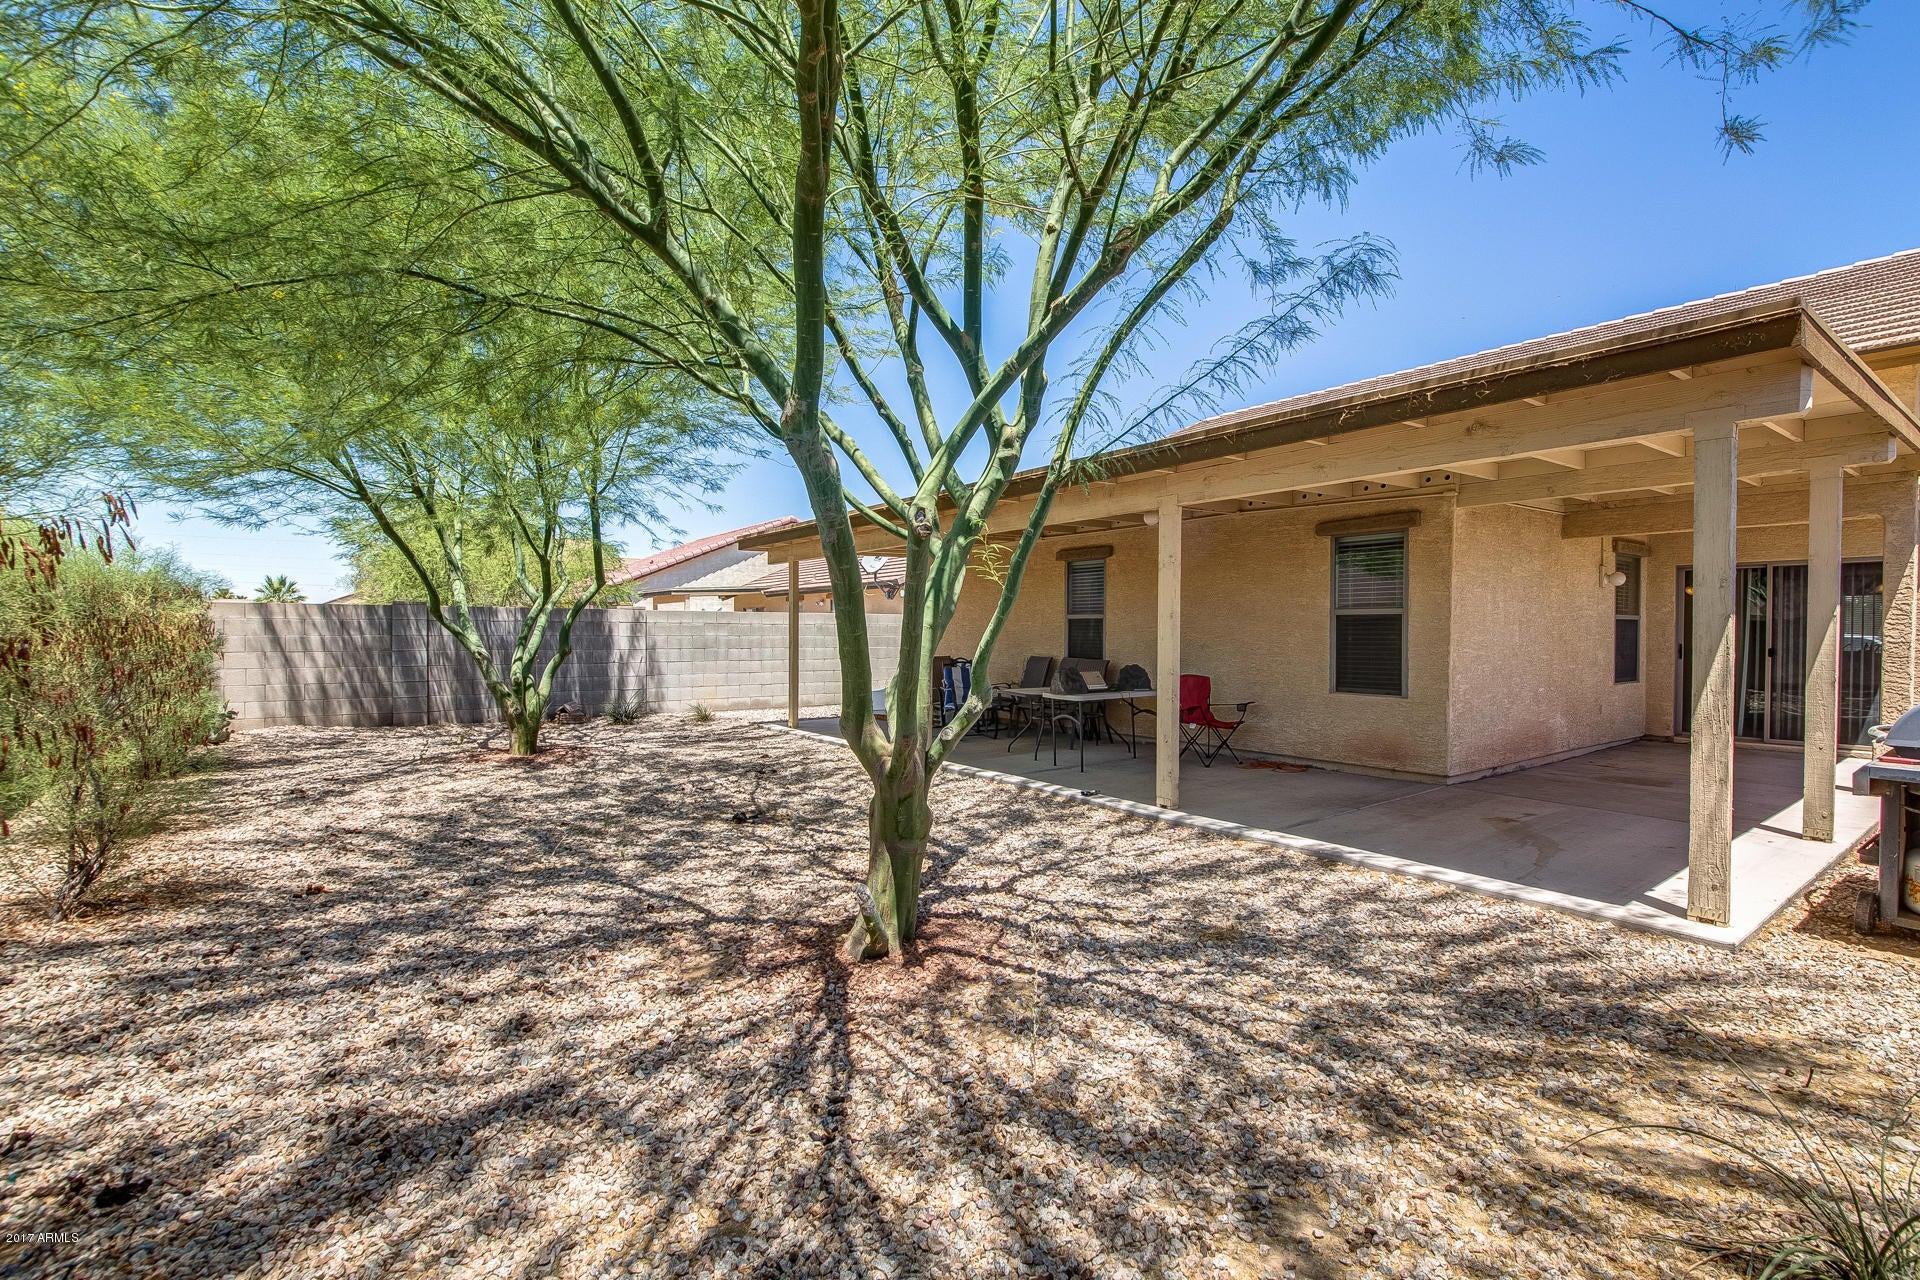 MLS 5621294 25005 W ILLINI Street, Buckeye, AZ 85326 Buckeye AZ Rancho Vista